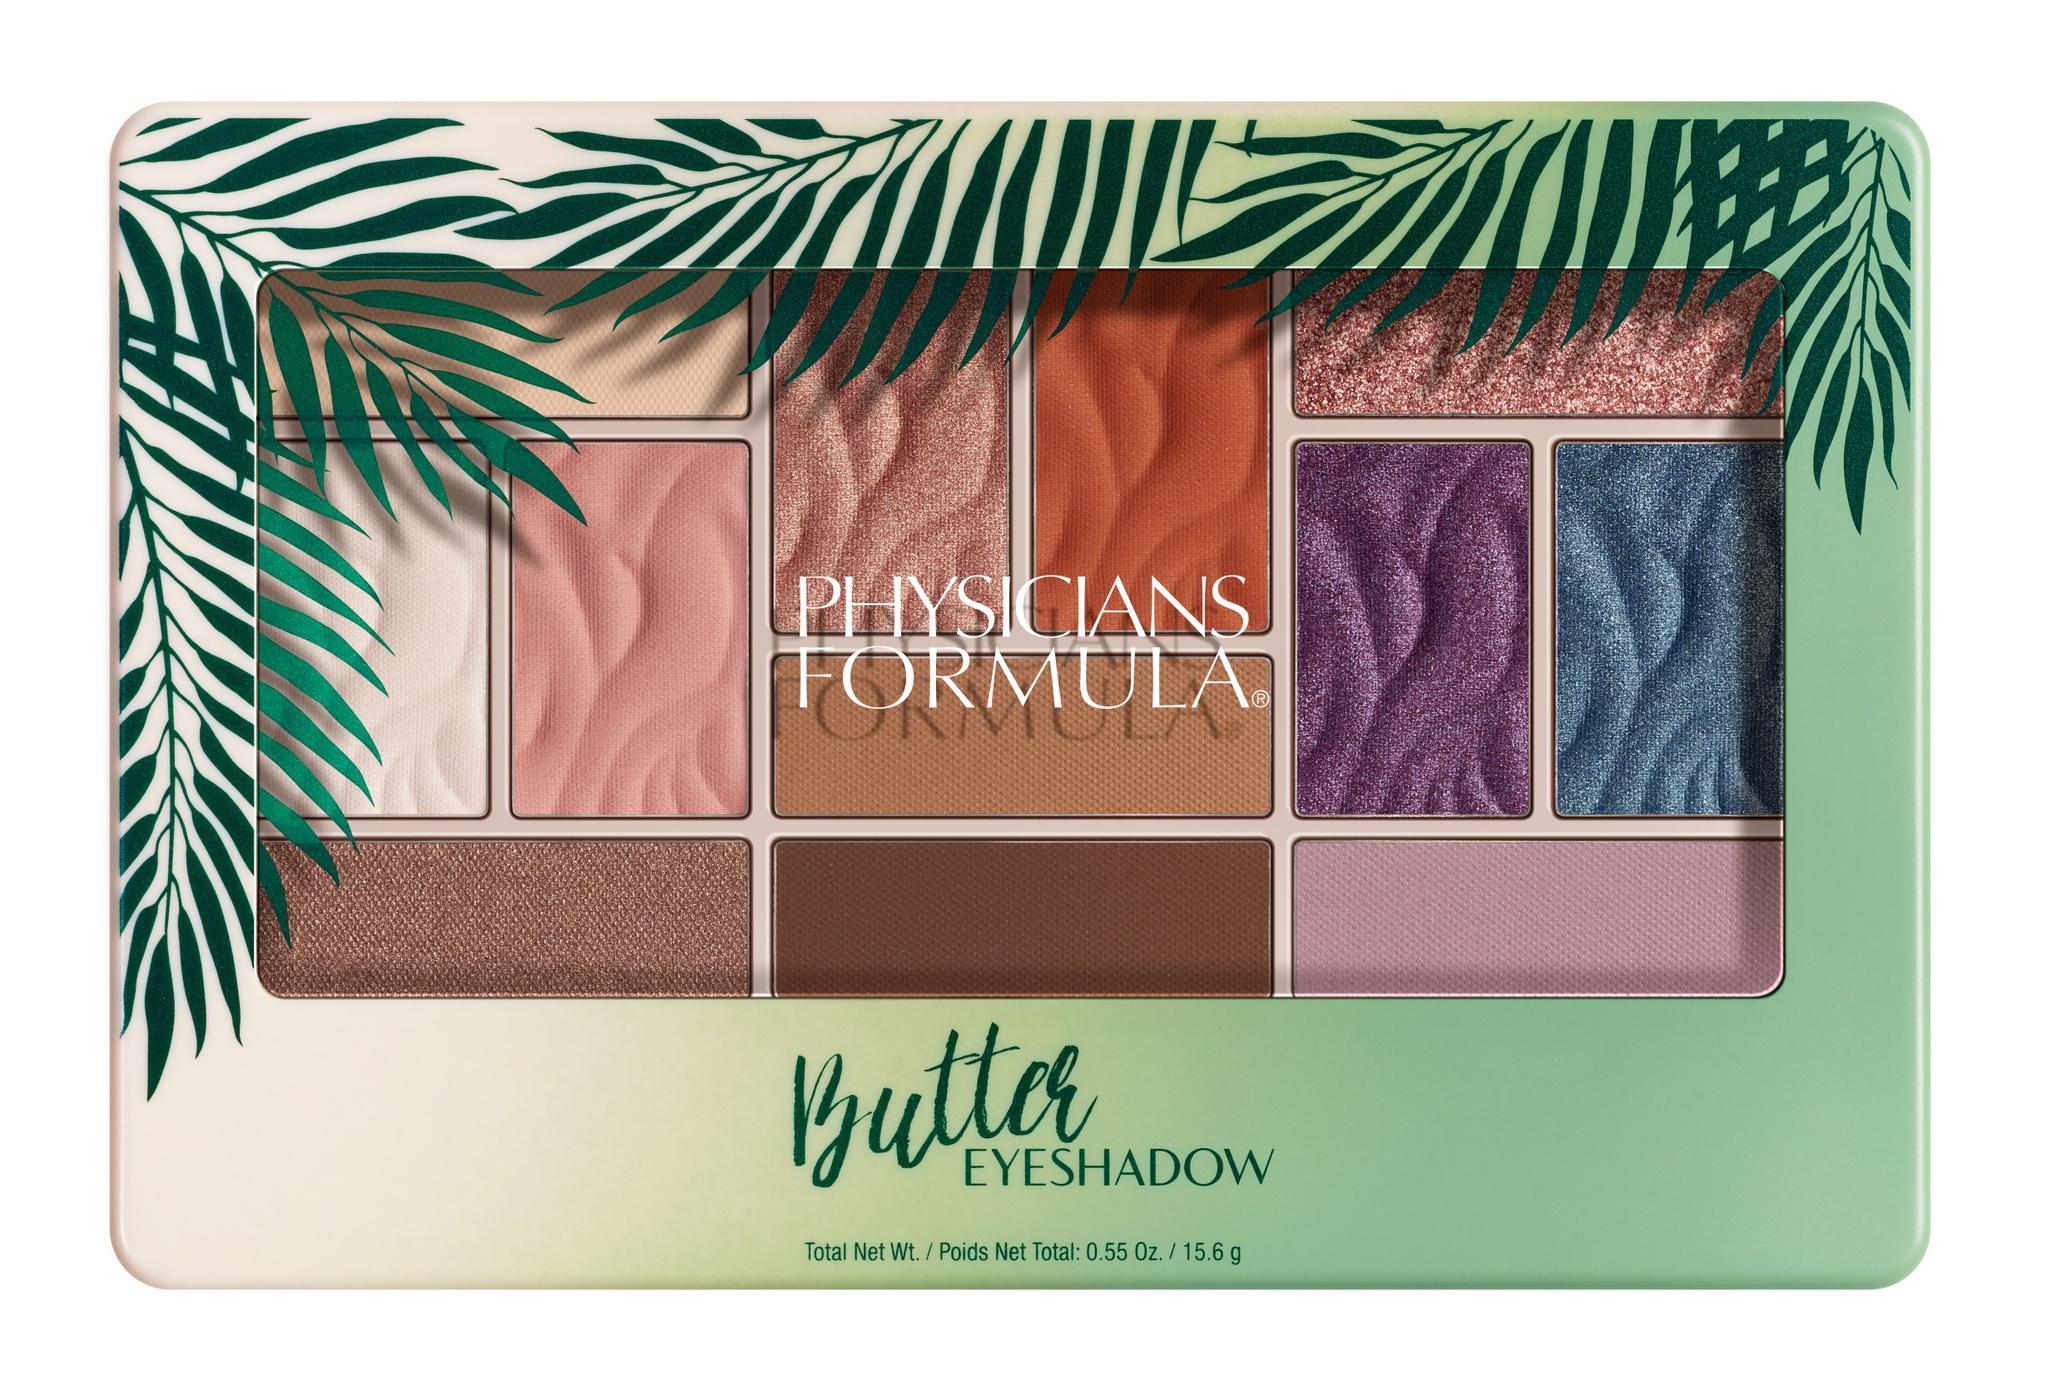 Physicians Formula Murumuru Butter Eyeshadow Palette- Tropical Days